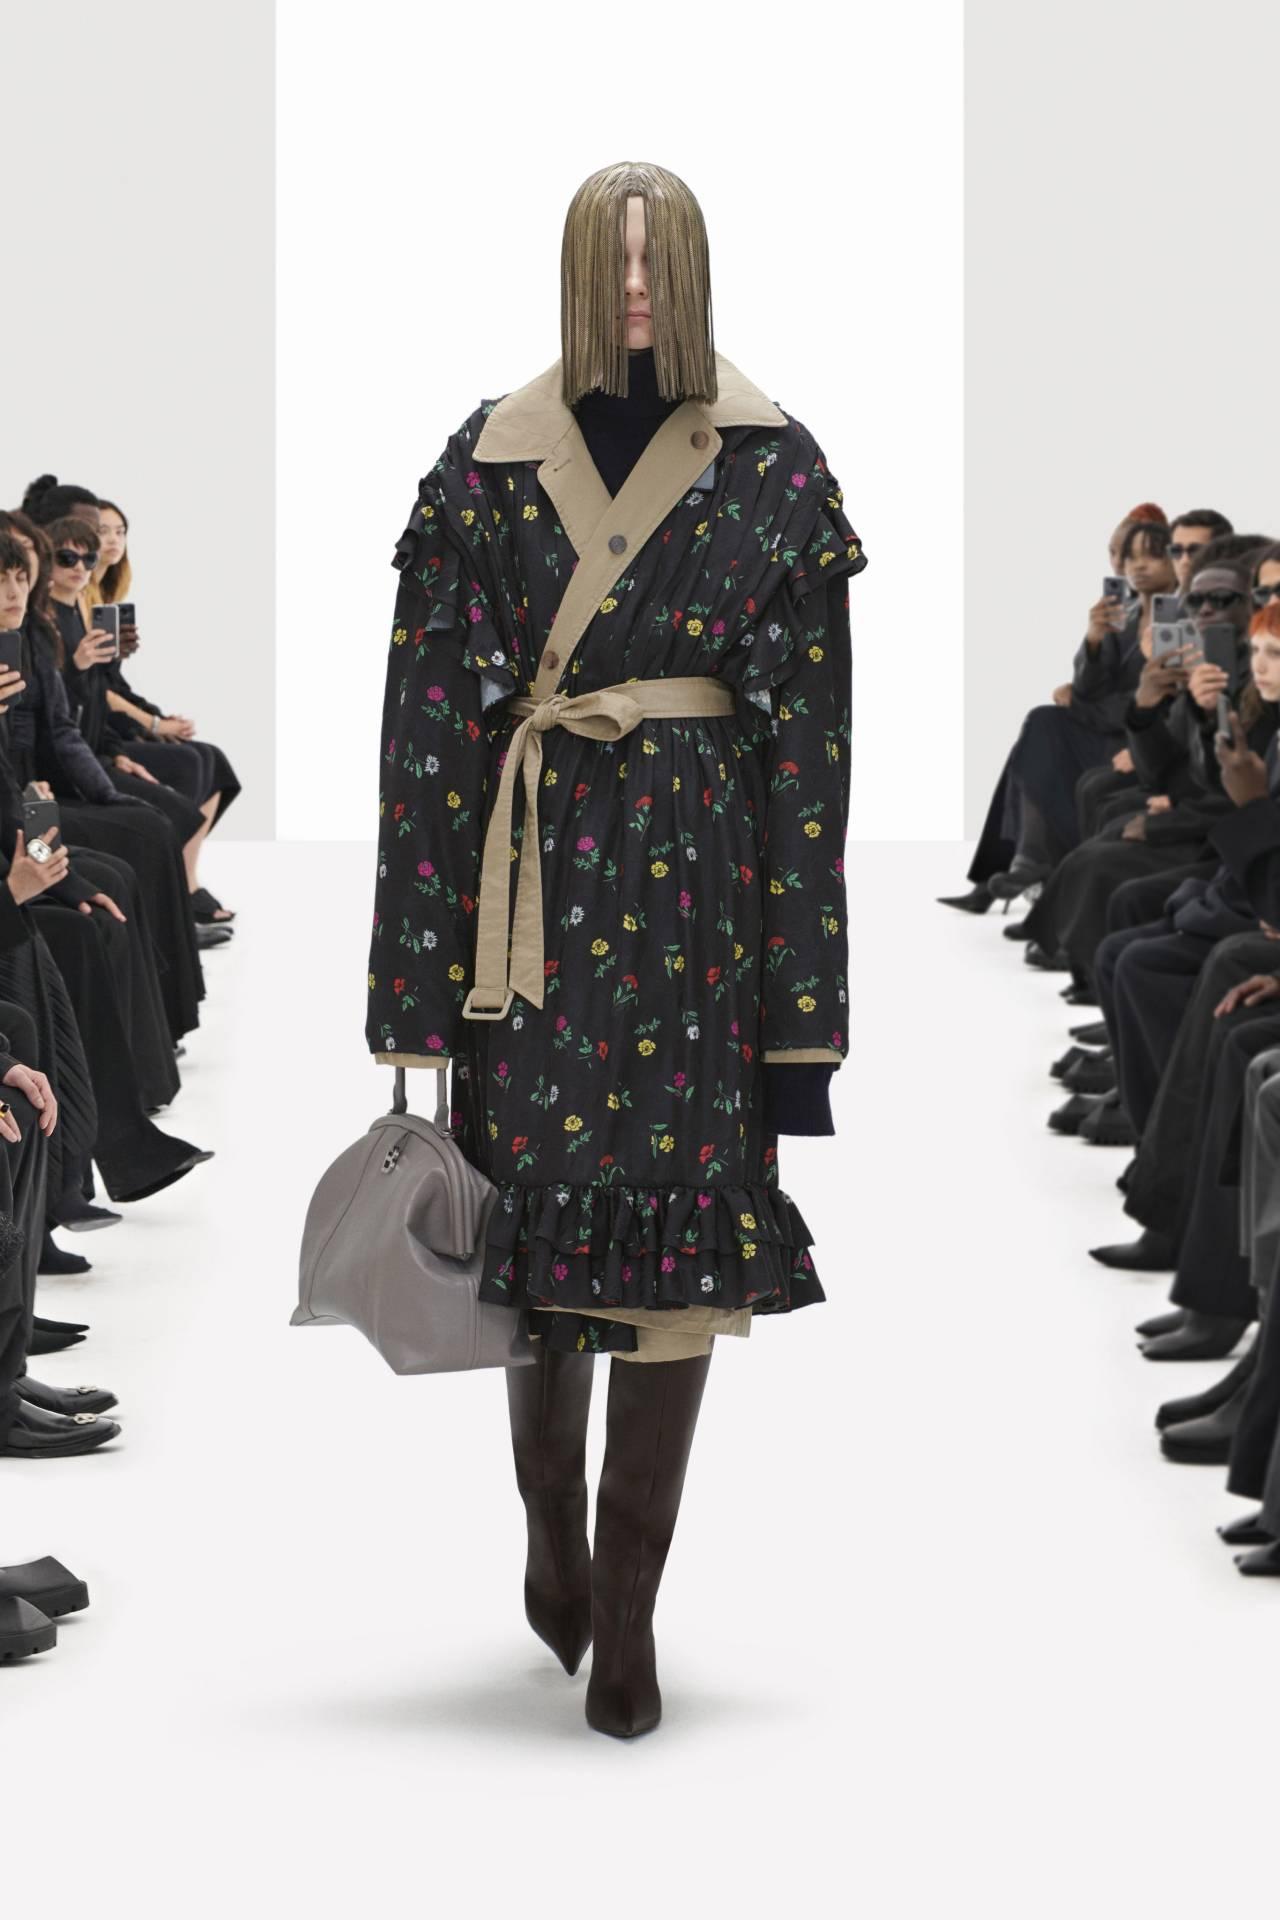 #Balenciaga#fashion#style #spring 2022 ready to wear  #ready to wear #rtw